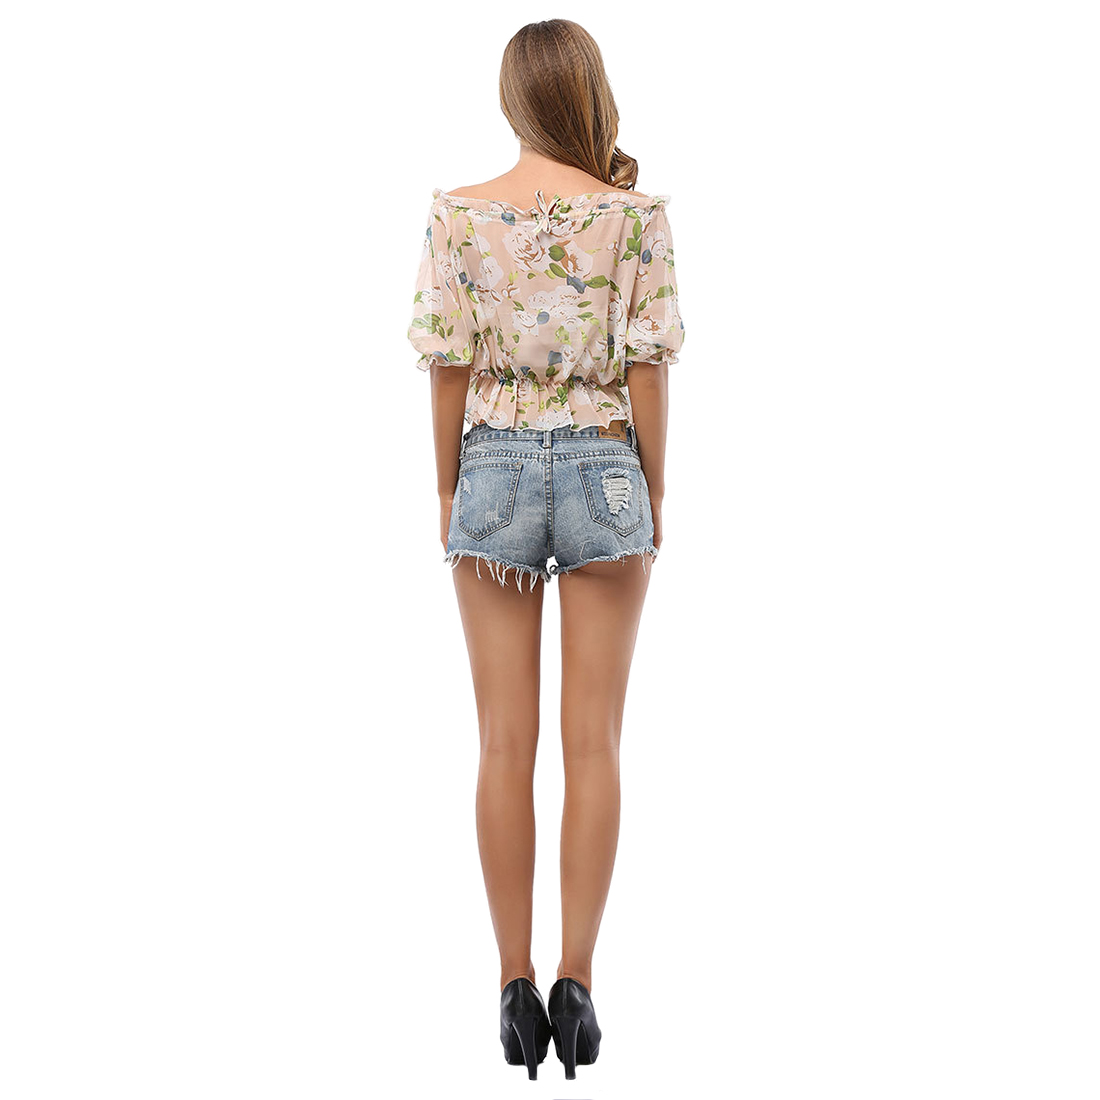 TKOH Womens New Summer Sexy Chiffon Half Sleeve Shirt Ladies Crop tops Off shoulder Halter Print Flower Elastic Waist